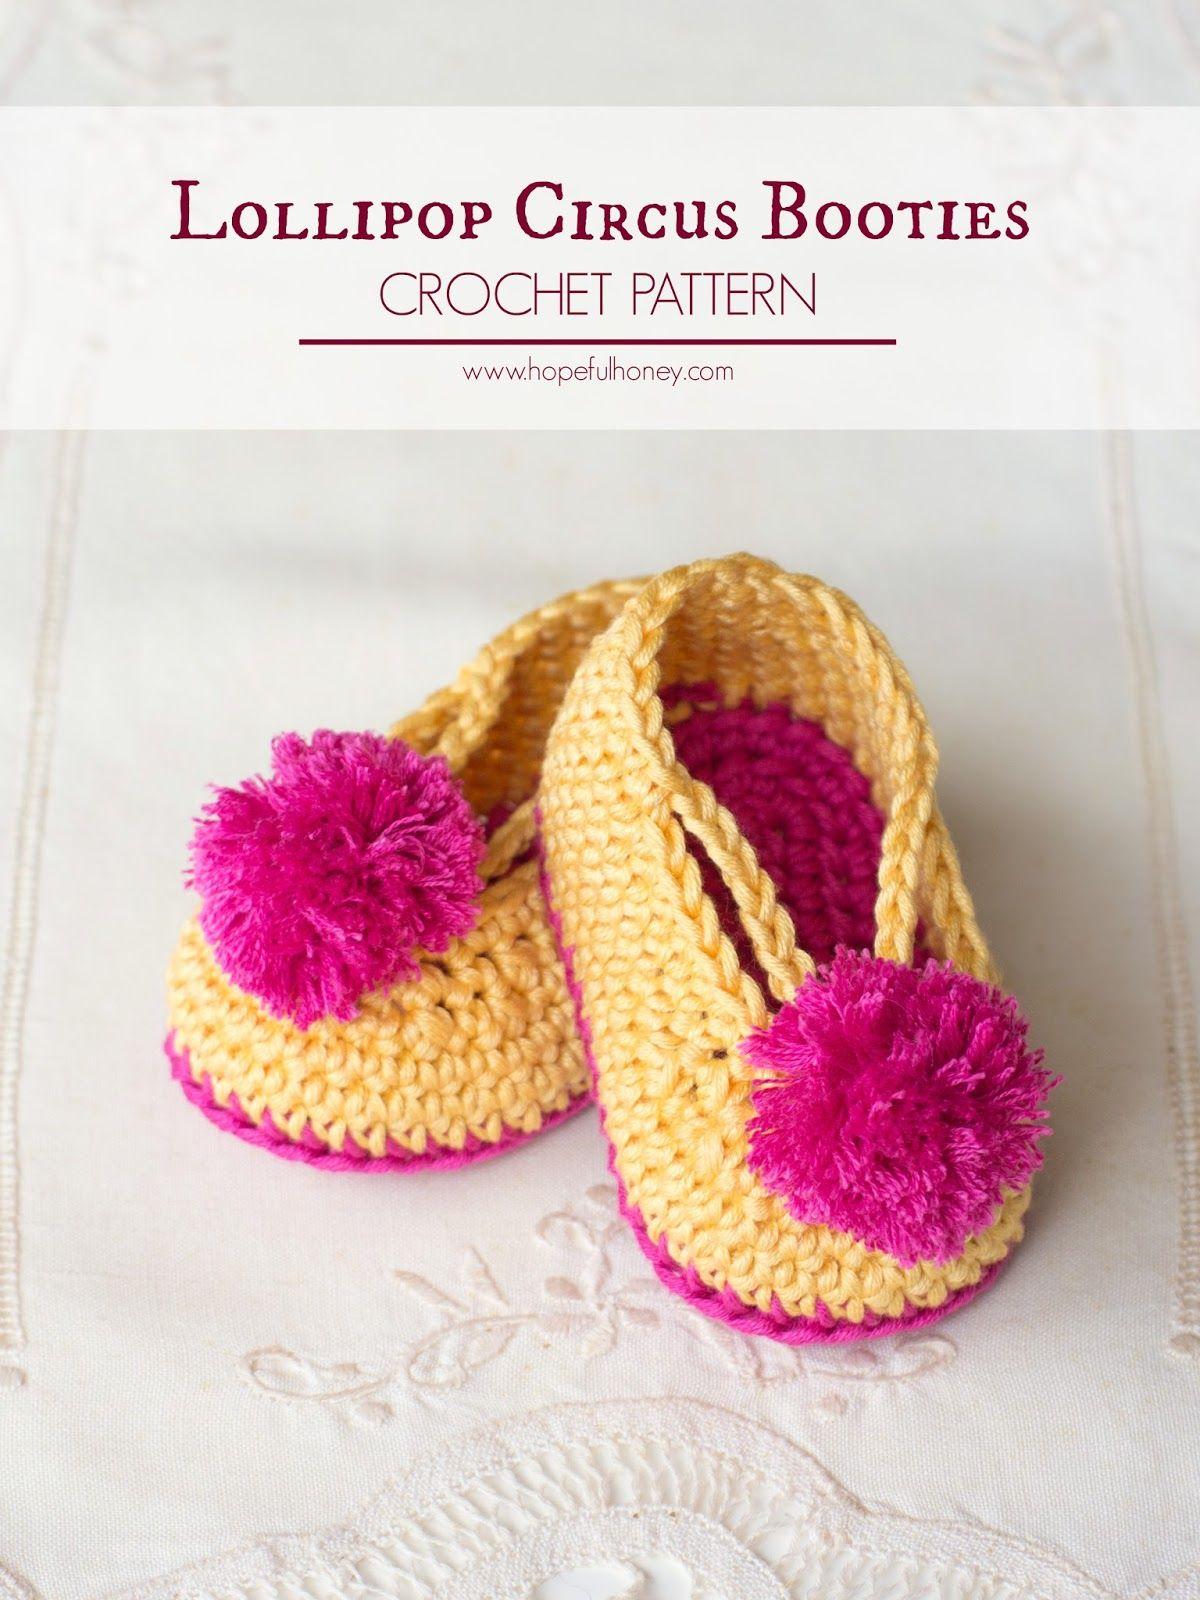 Lollipop Circus Baby Booties - Free Crochet Pattern | Pinterest ...